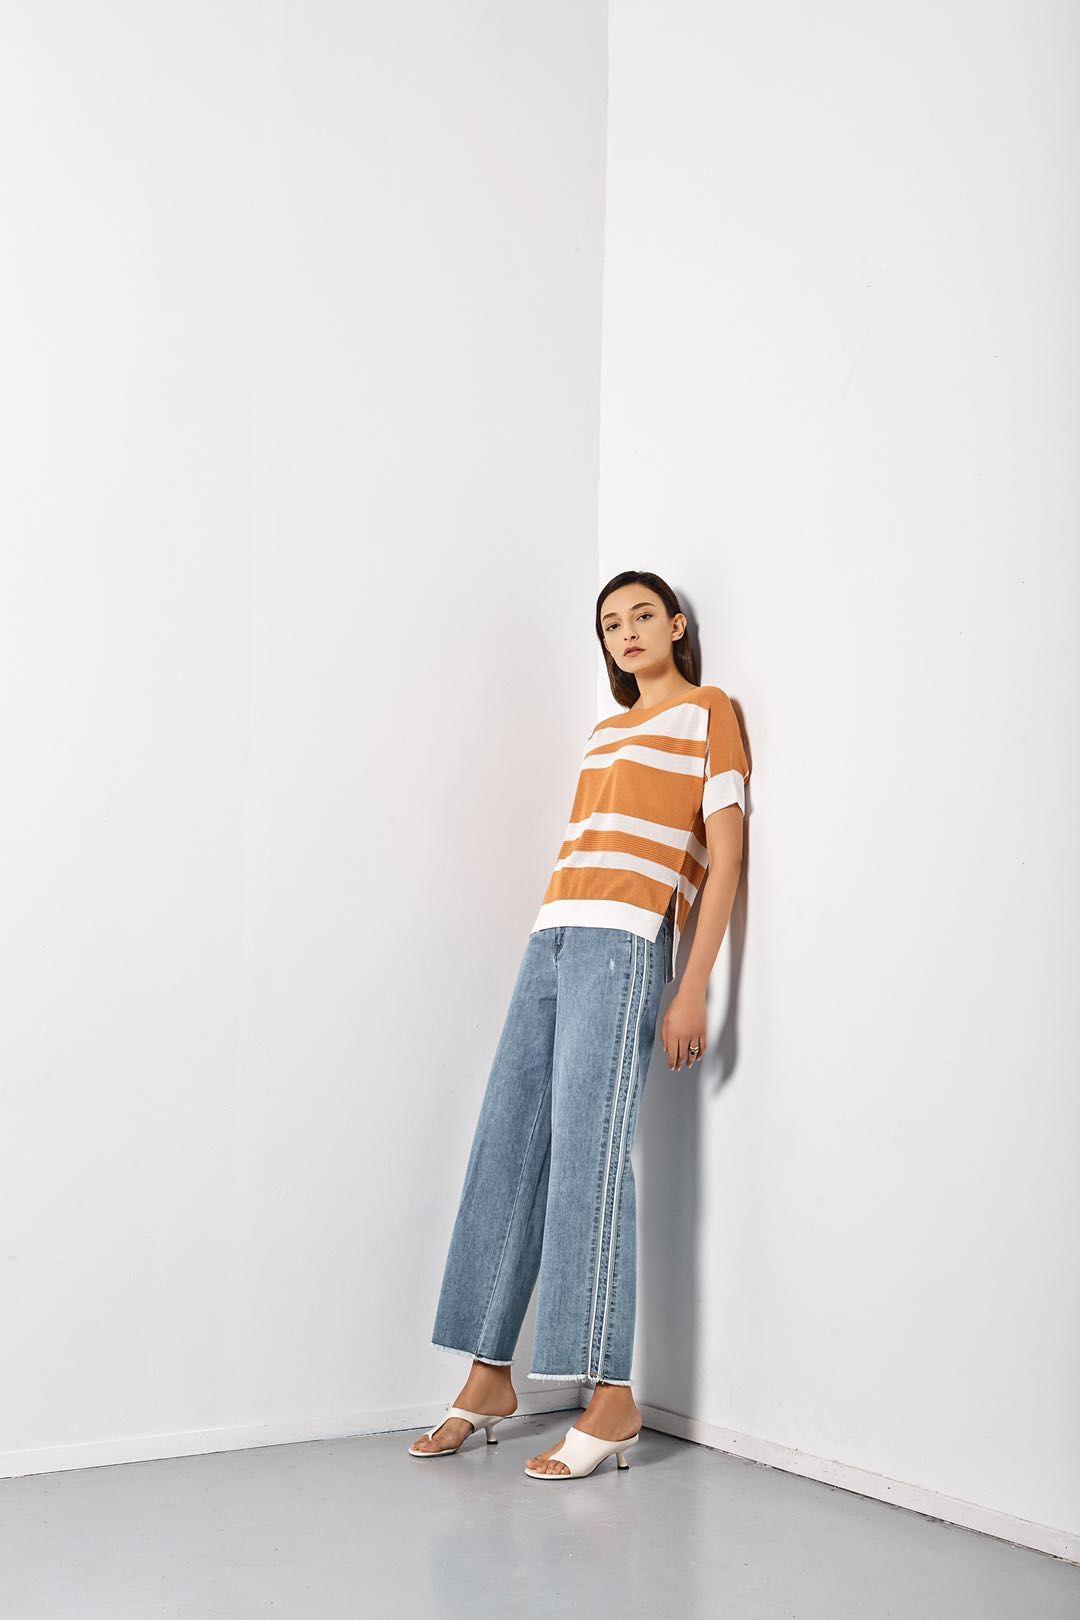 TOUR BUYER原创设计师女装货源时尚单品牛仔裤